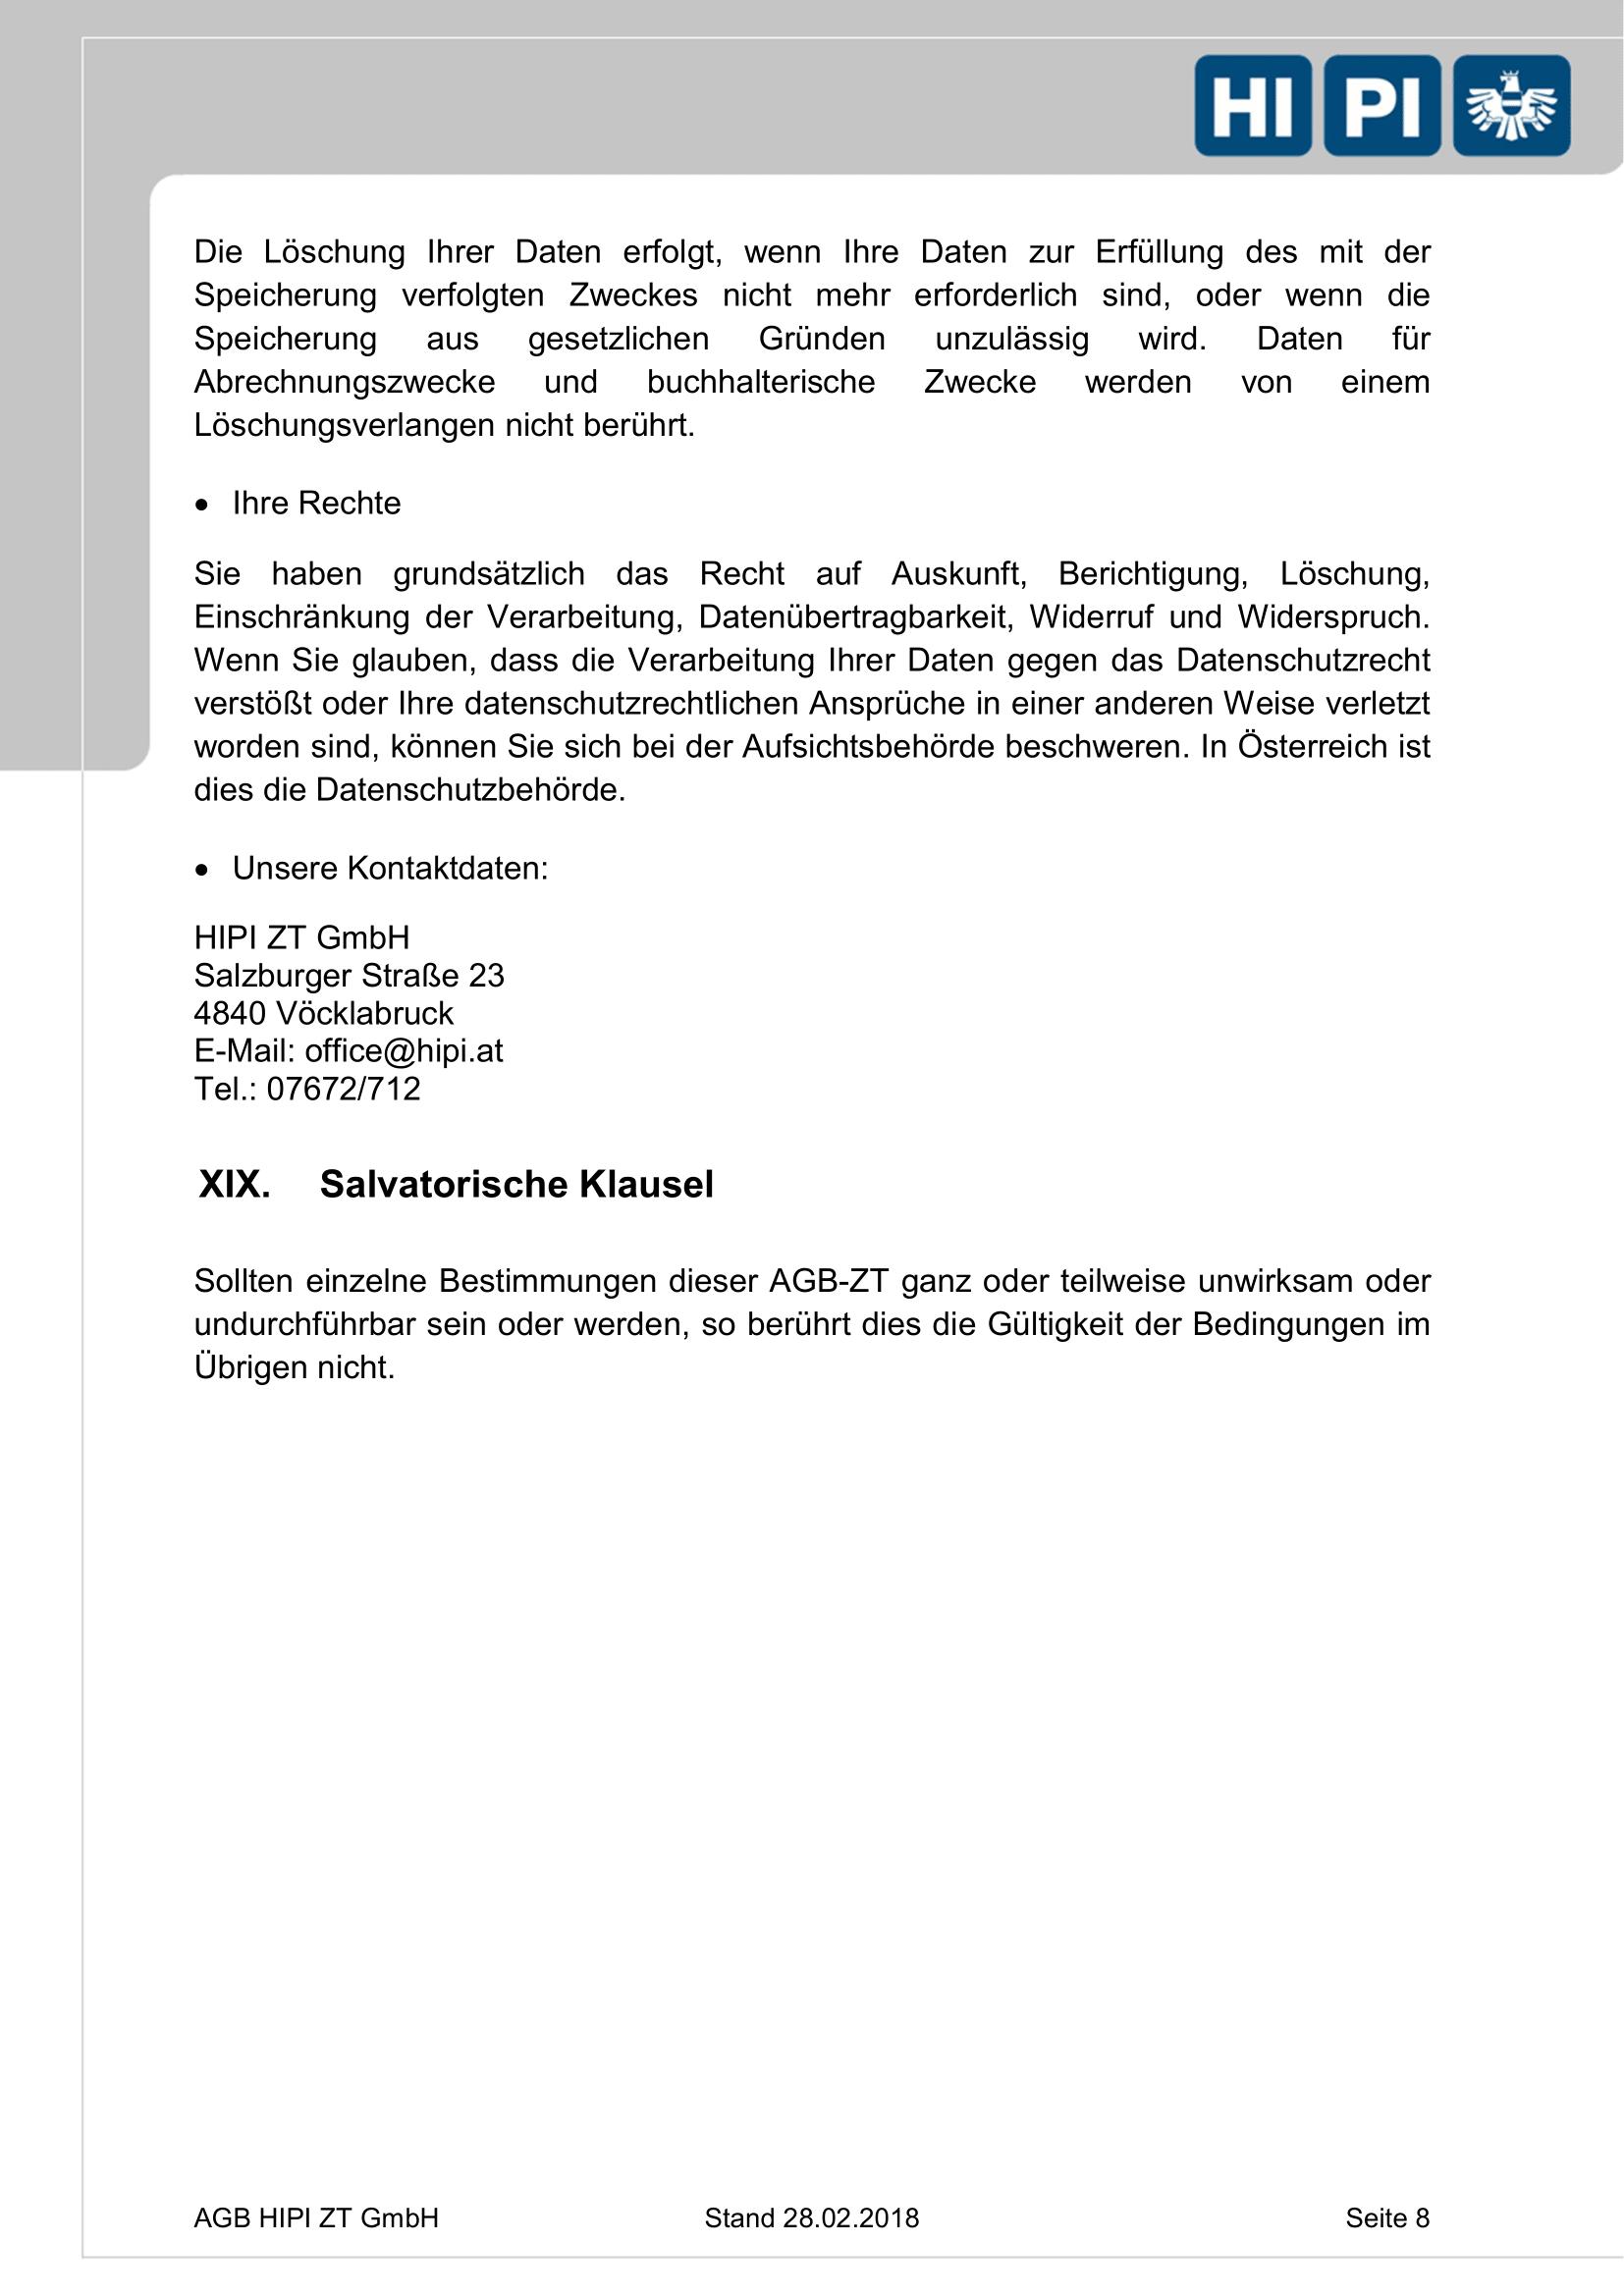 HIPI ZT GmbH AGB Seite 8